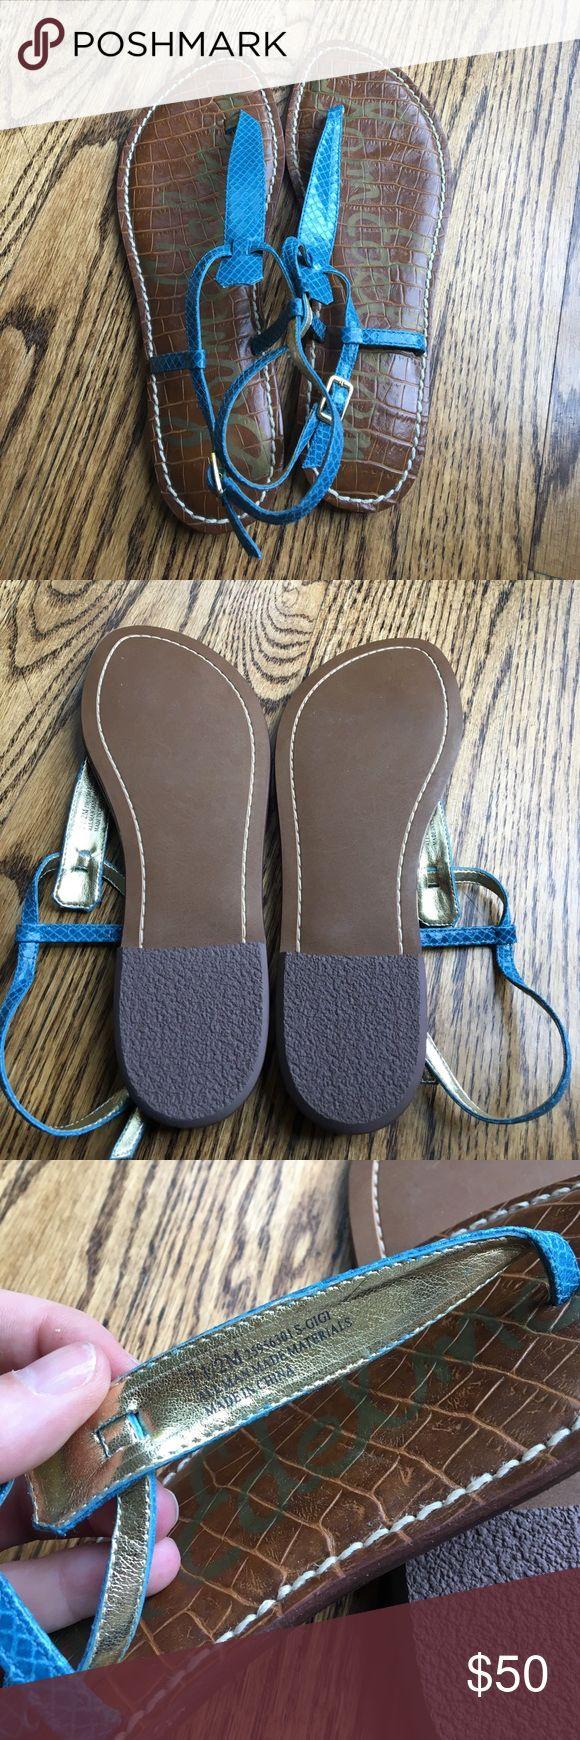 NWOT Sam Edelman Gigi Sandals Light blue snake skin sandals. Never worn, perfect condition. Size 7.5! Sam Edelman Shoes Sandals